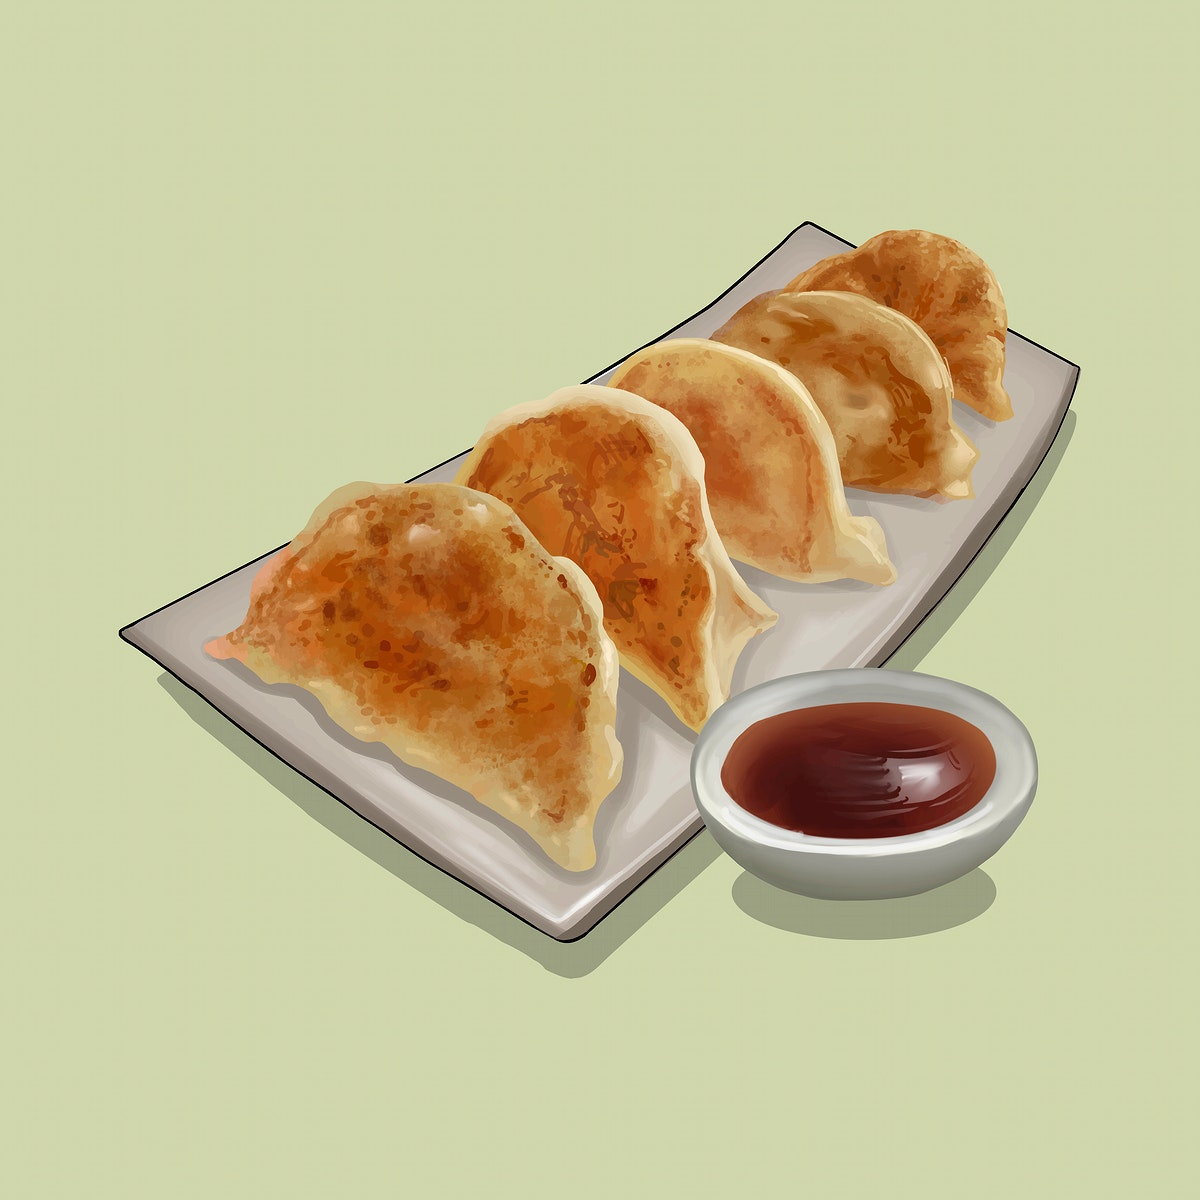 Japanese Gyoza with dipping sauce